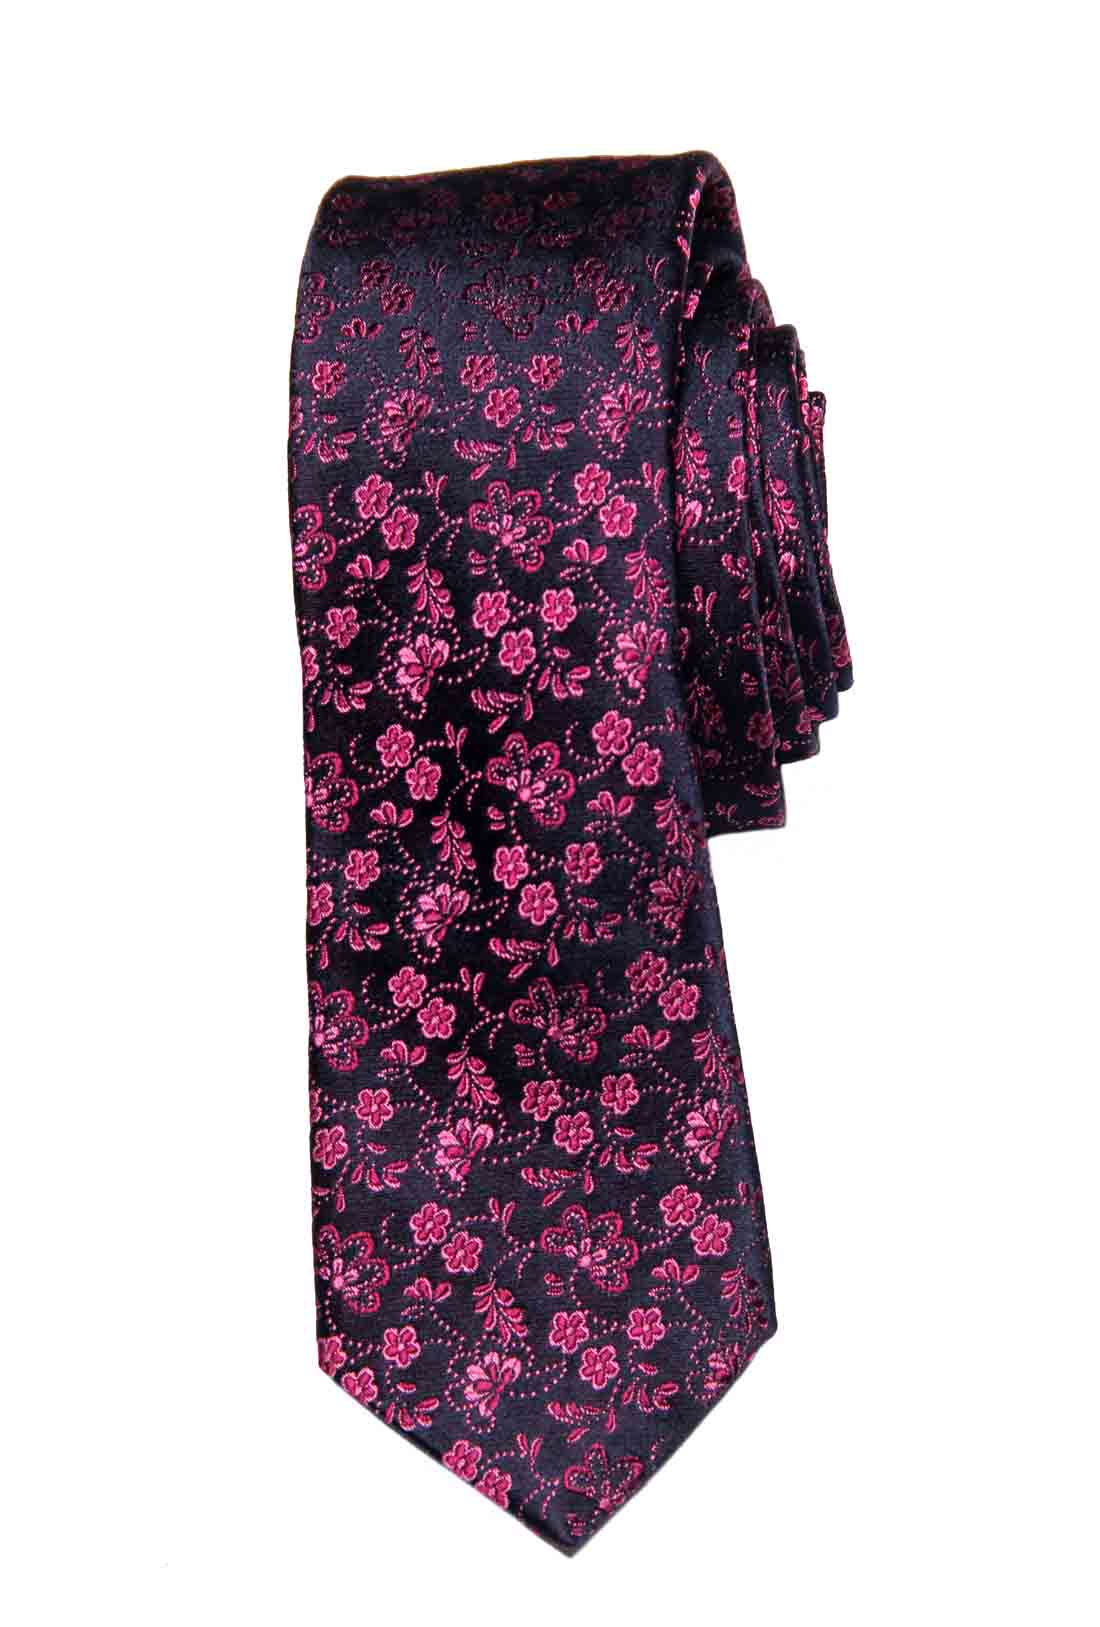 Ted Baker Italian Silk Tie Red Pink Black Floral Narrow Men's